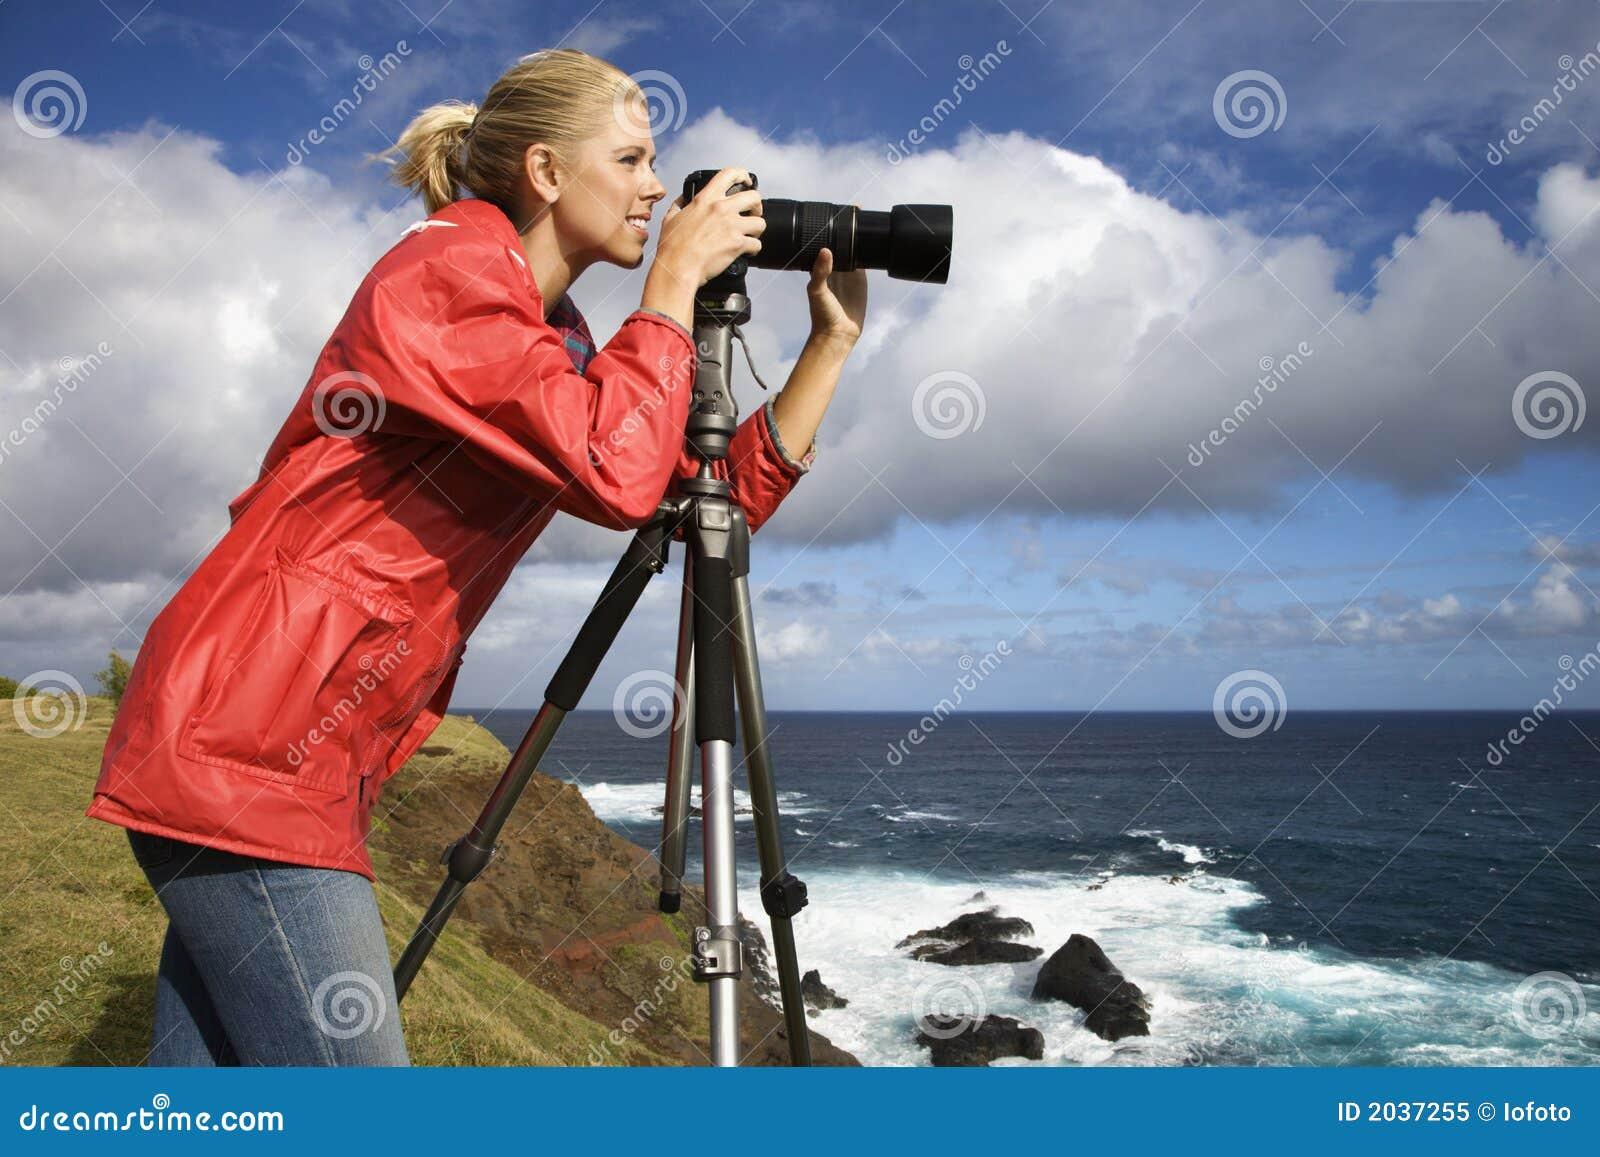 Woman photographing scenery in Maui, Hawaii.